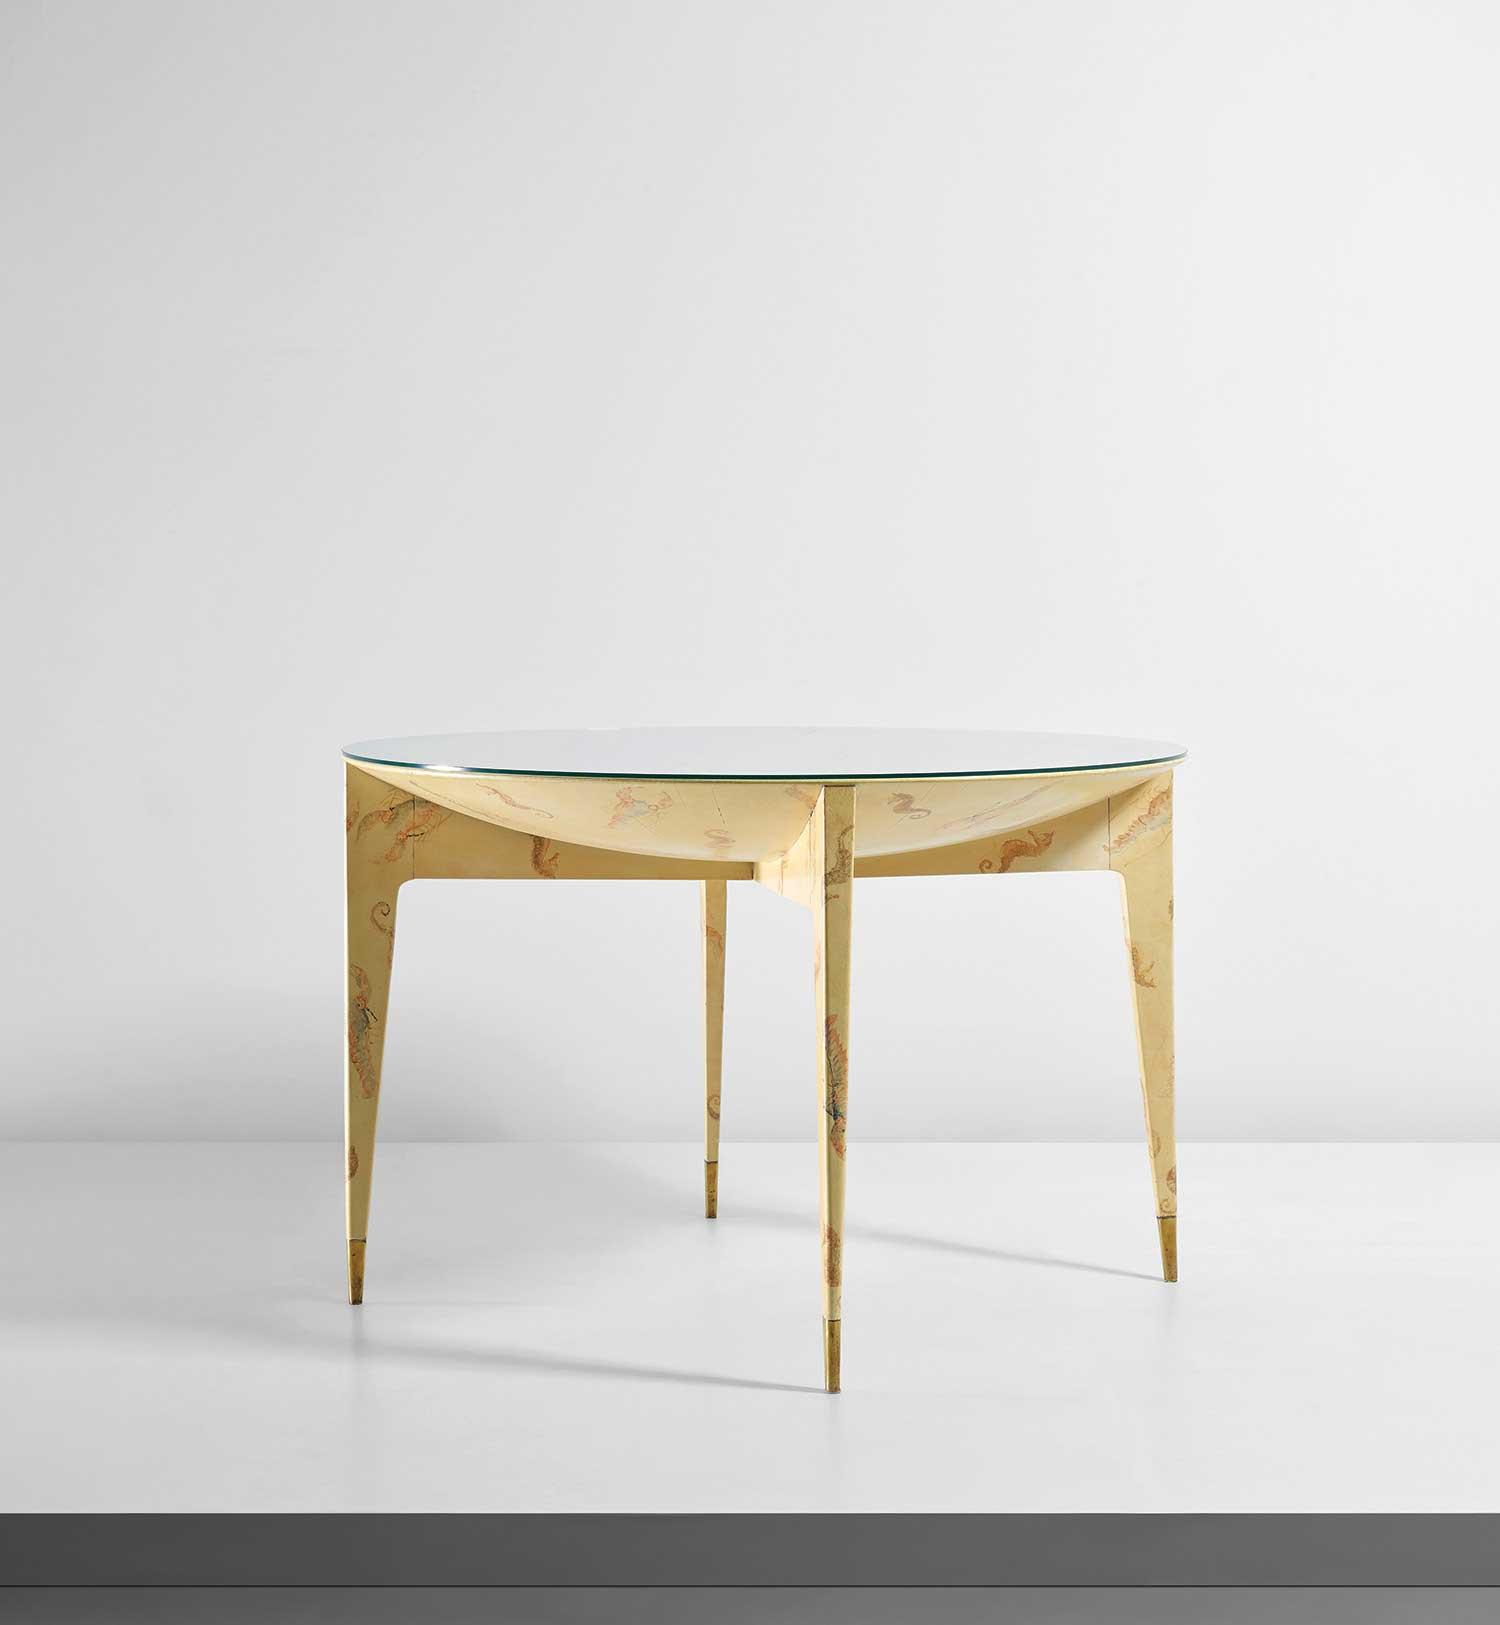 Gio-Ponti-and-Piero-Fornasetti_Prototype-dinning-table,-early-1950s.jpg